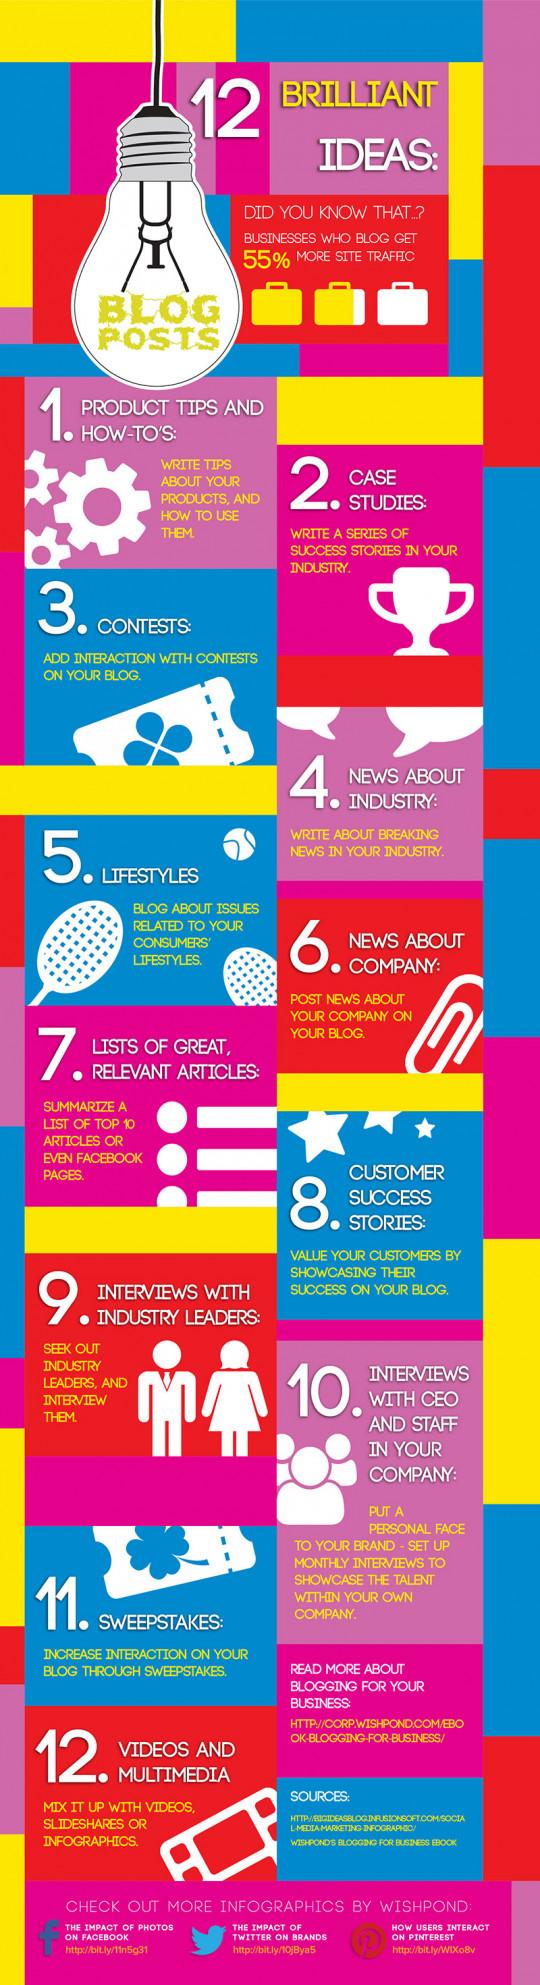 12 Brilliant Blog Post Ideas for Businesses